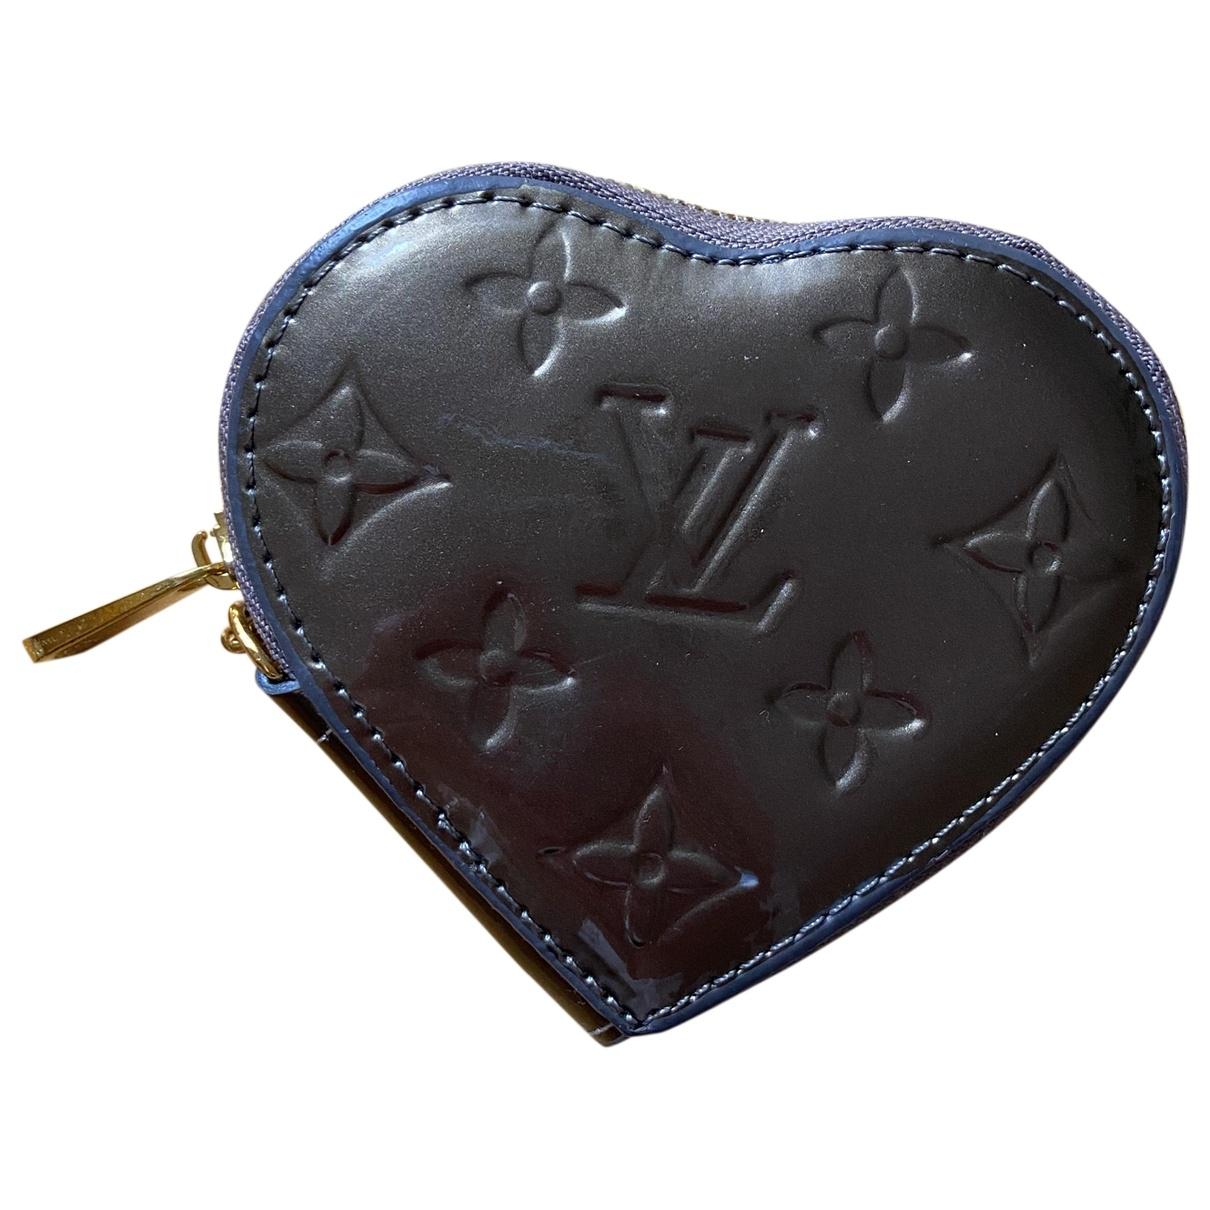 Monedero de Charol Louis Vuitton